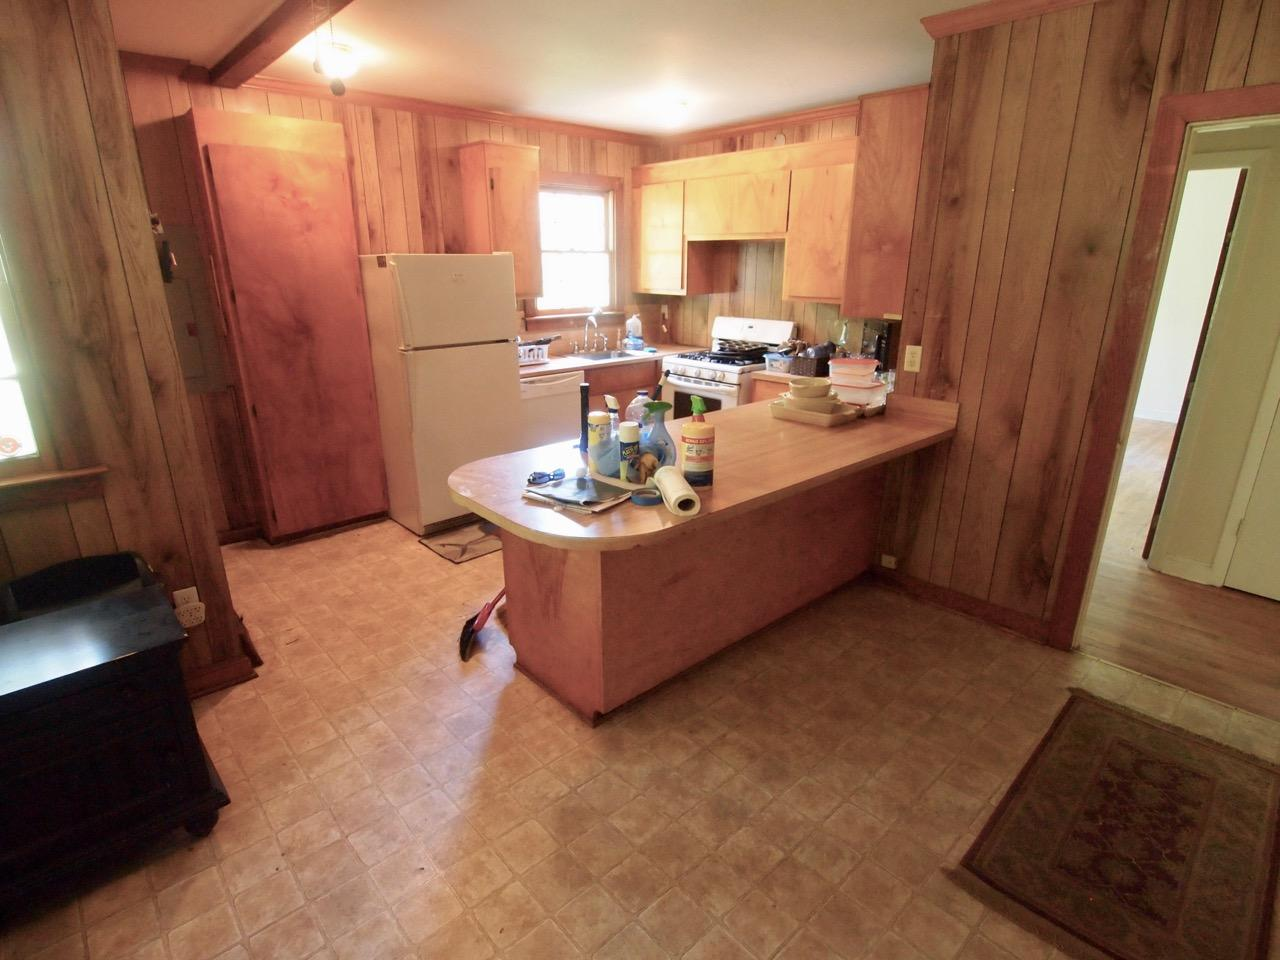 Bulow Plantation Homes For Sale - 1079 Hughes Rd., Johns Island, SC - 10